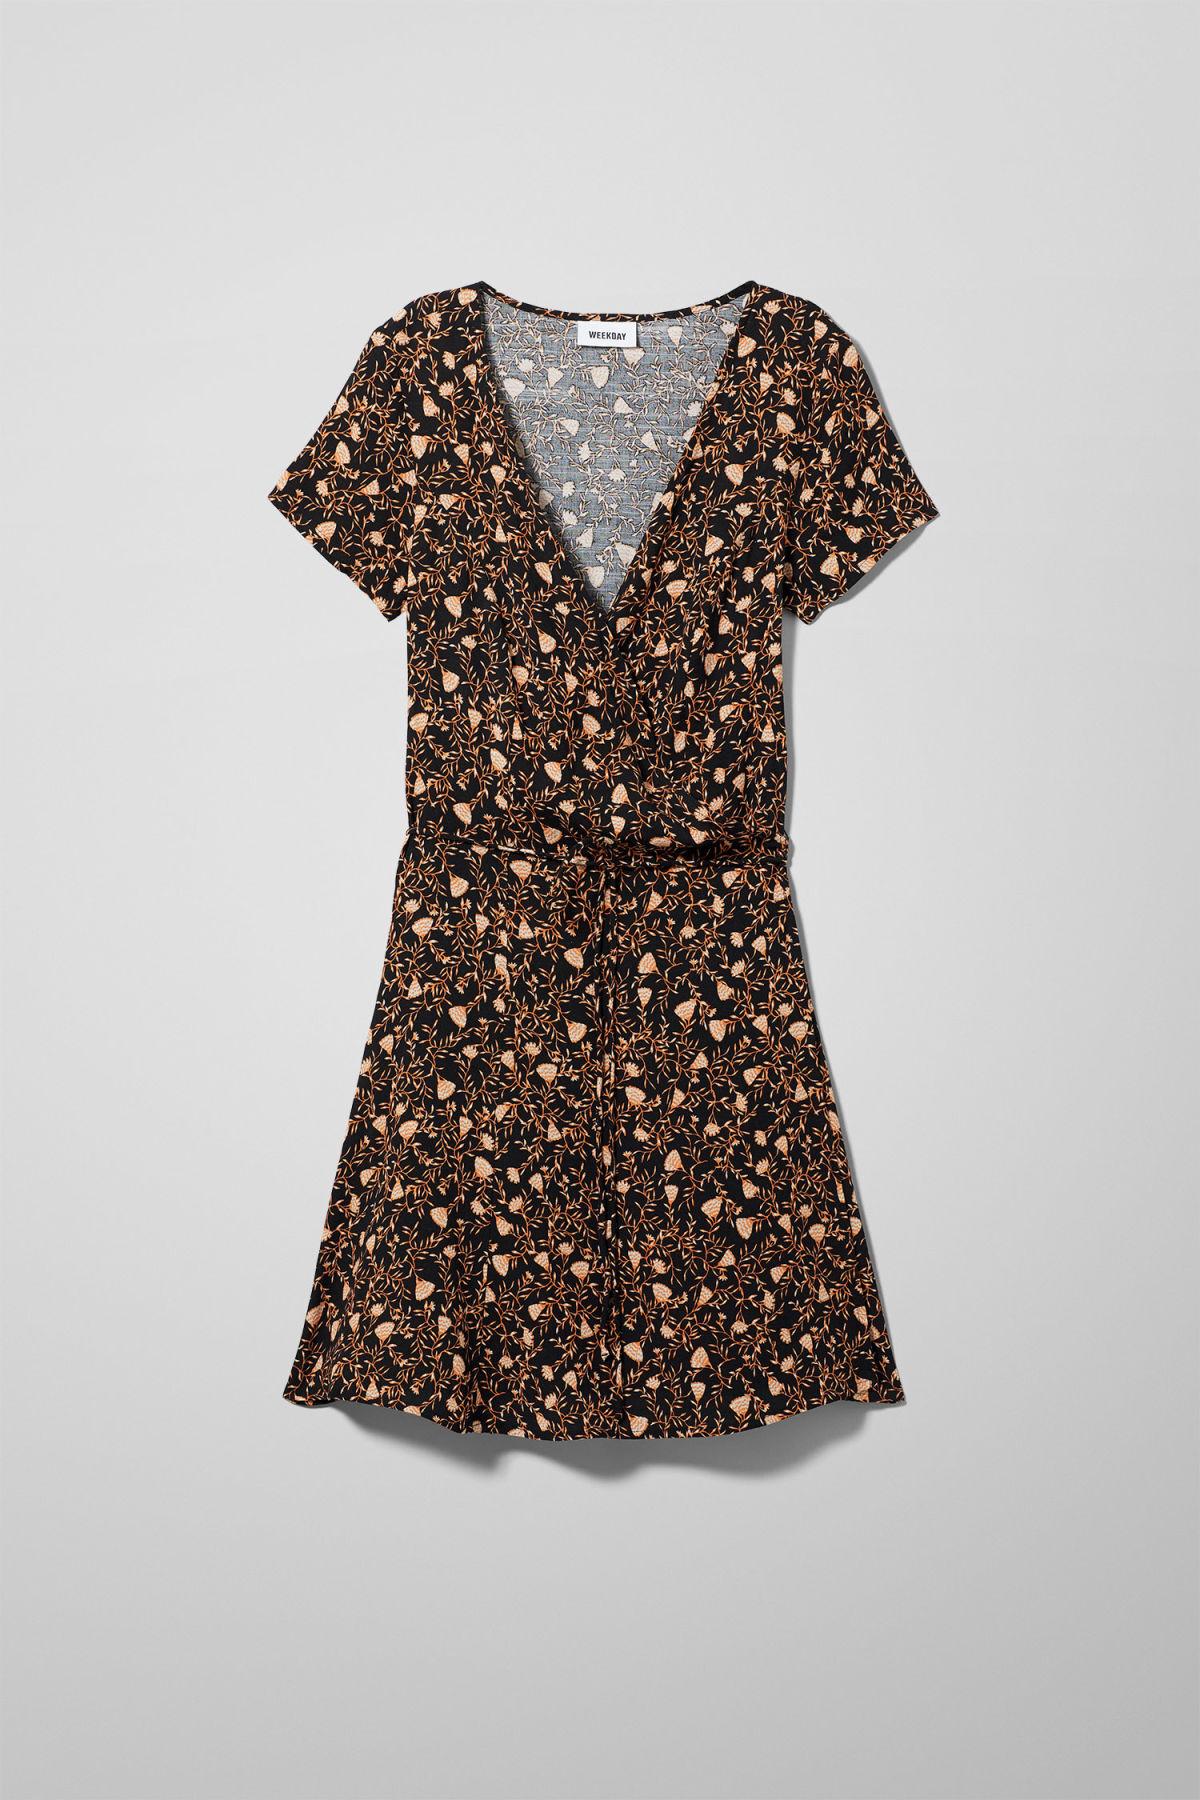 Image of Imogen Wrap Dress - Black-34